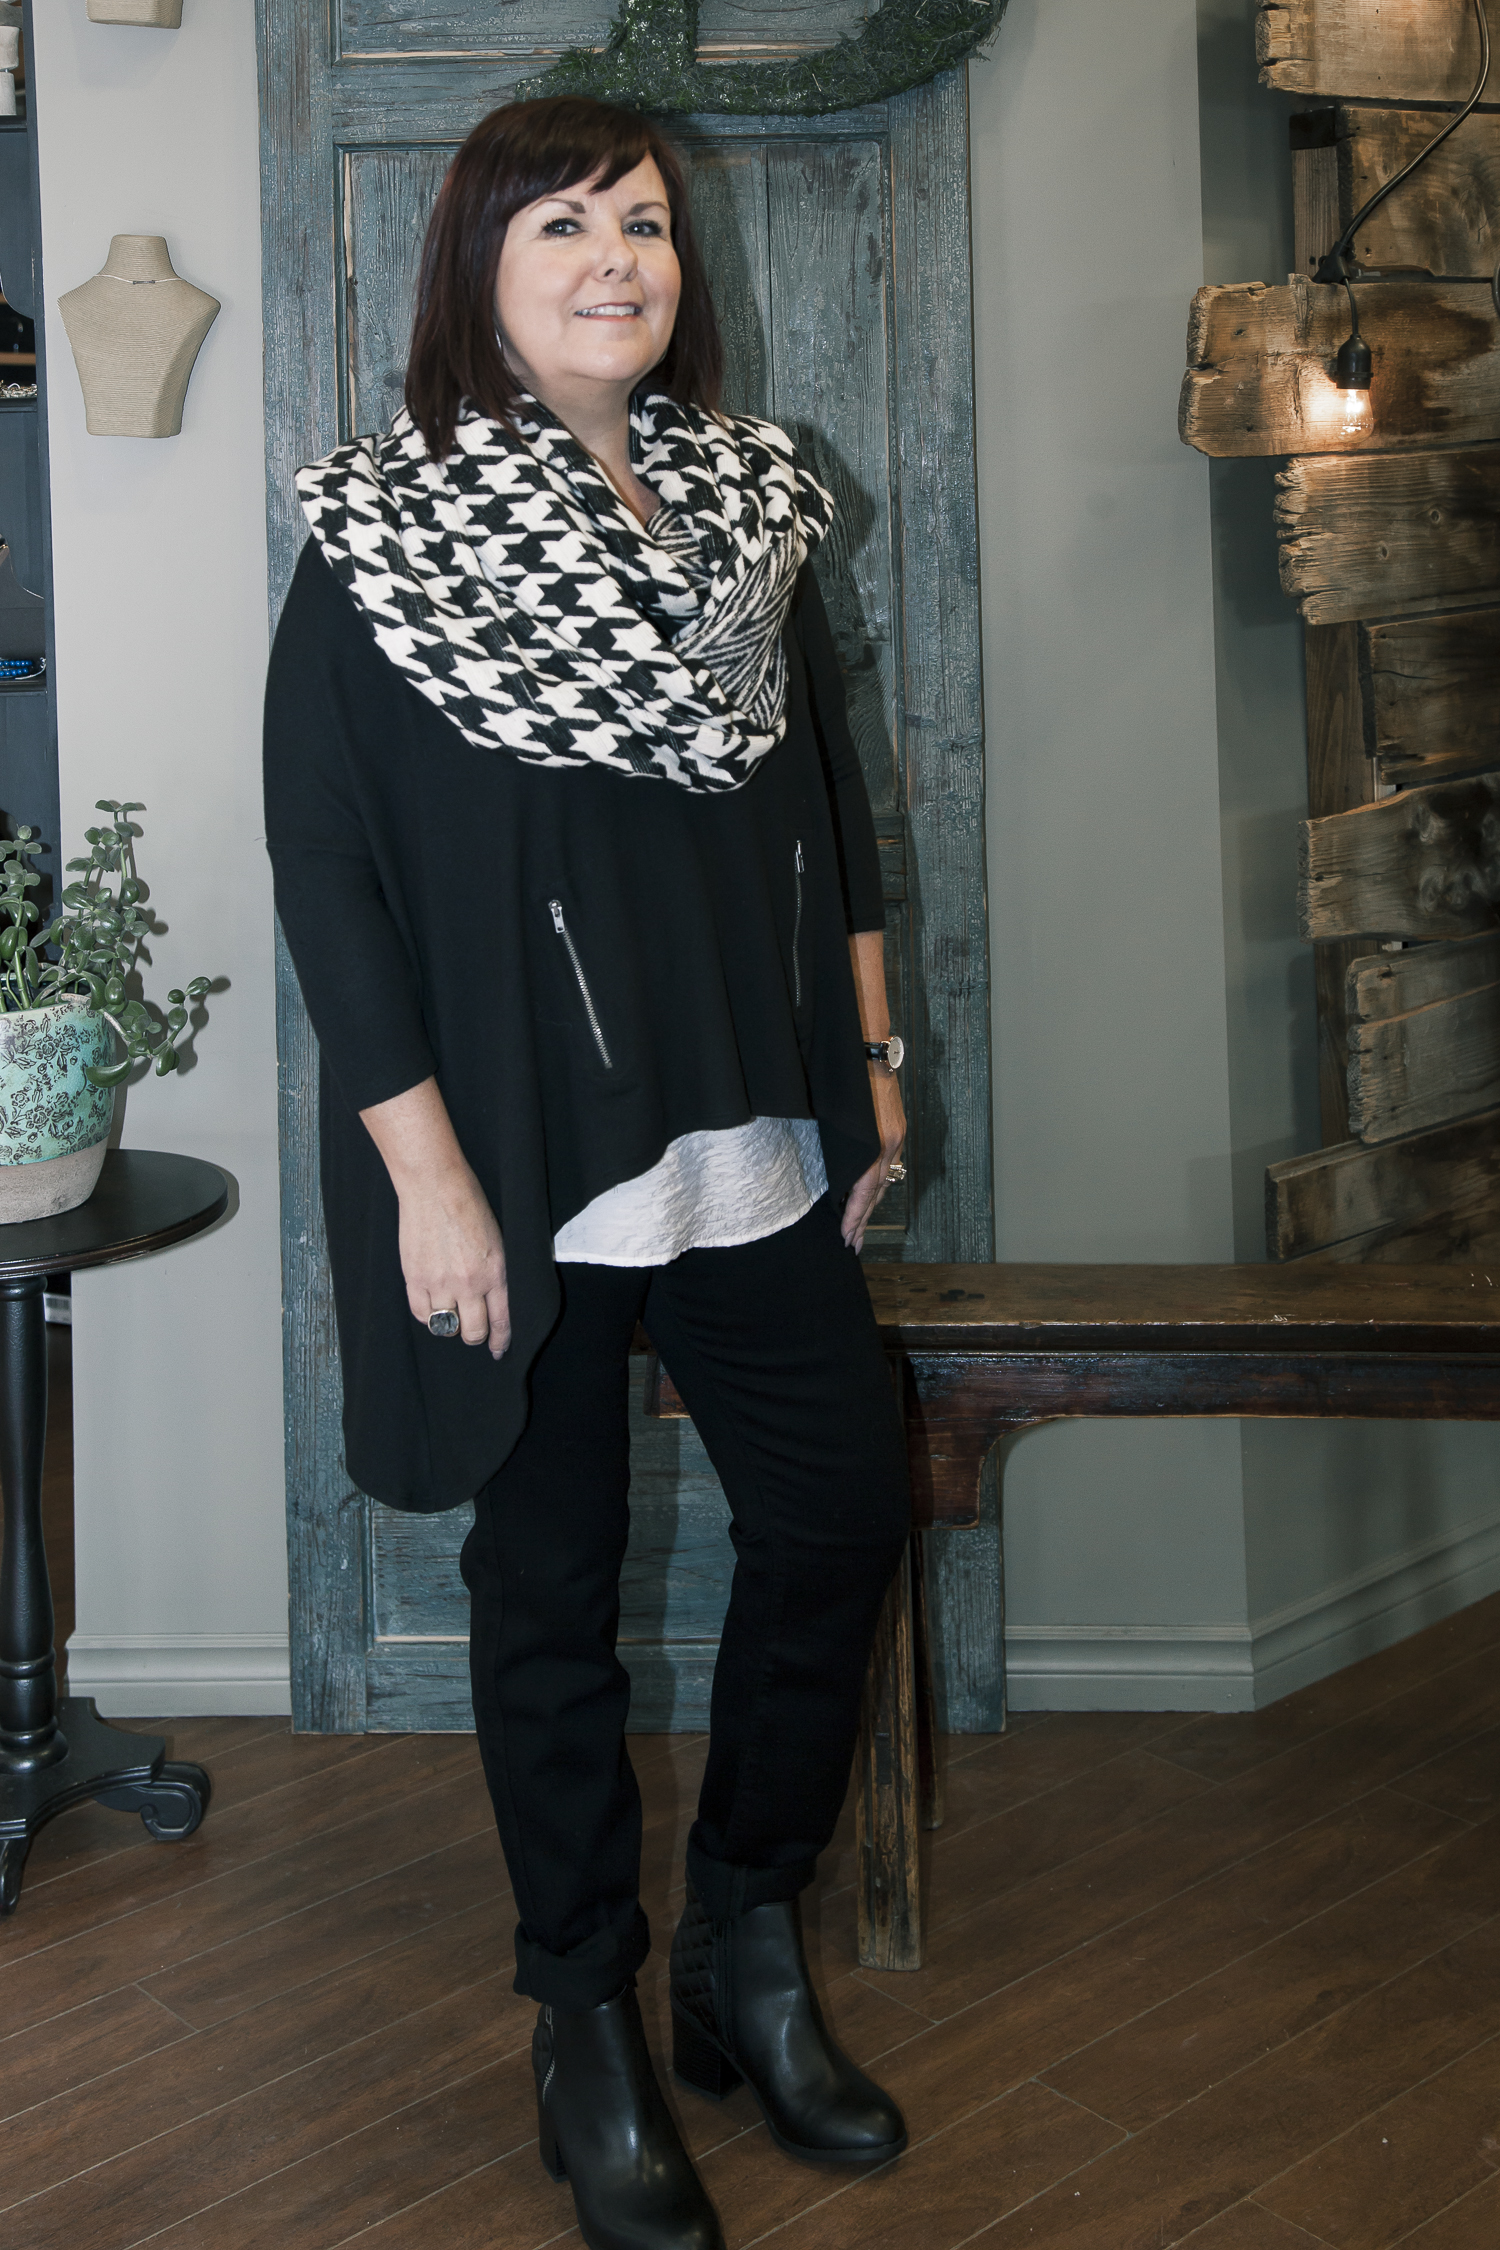 bella-maas-edmonton-fashion-trend-winter-cozy-layers-fidelity-jeans-MIA-shoes